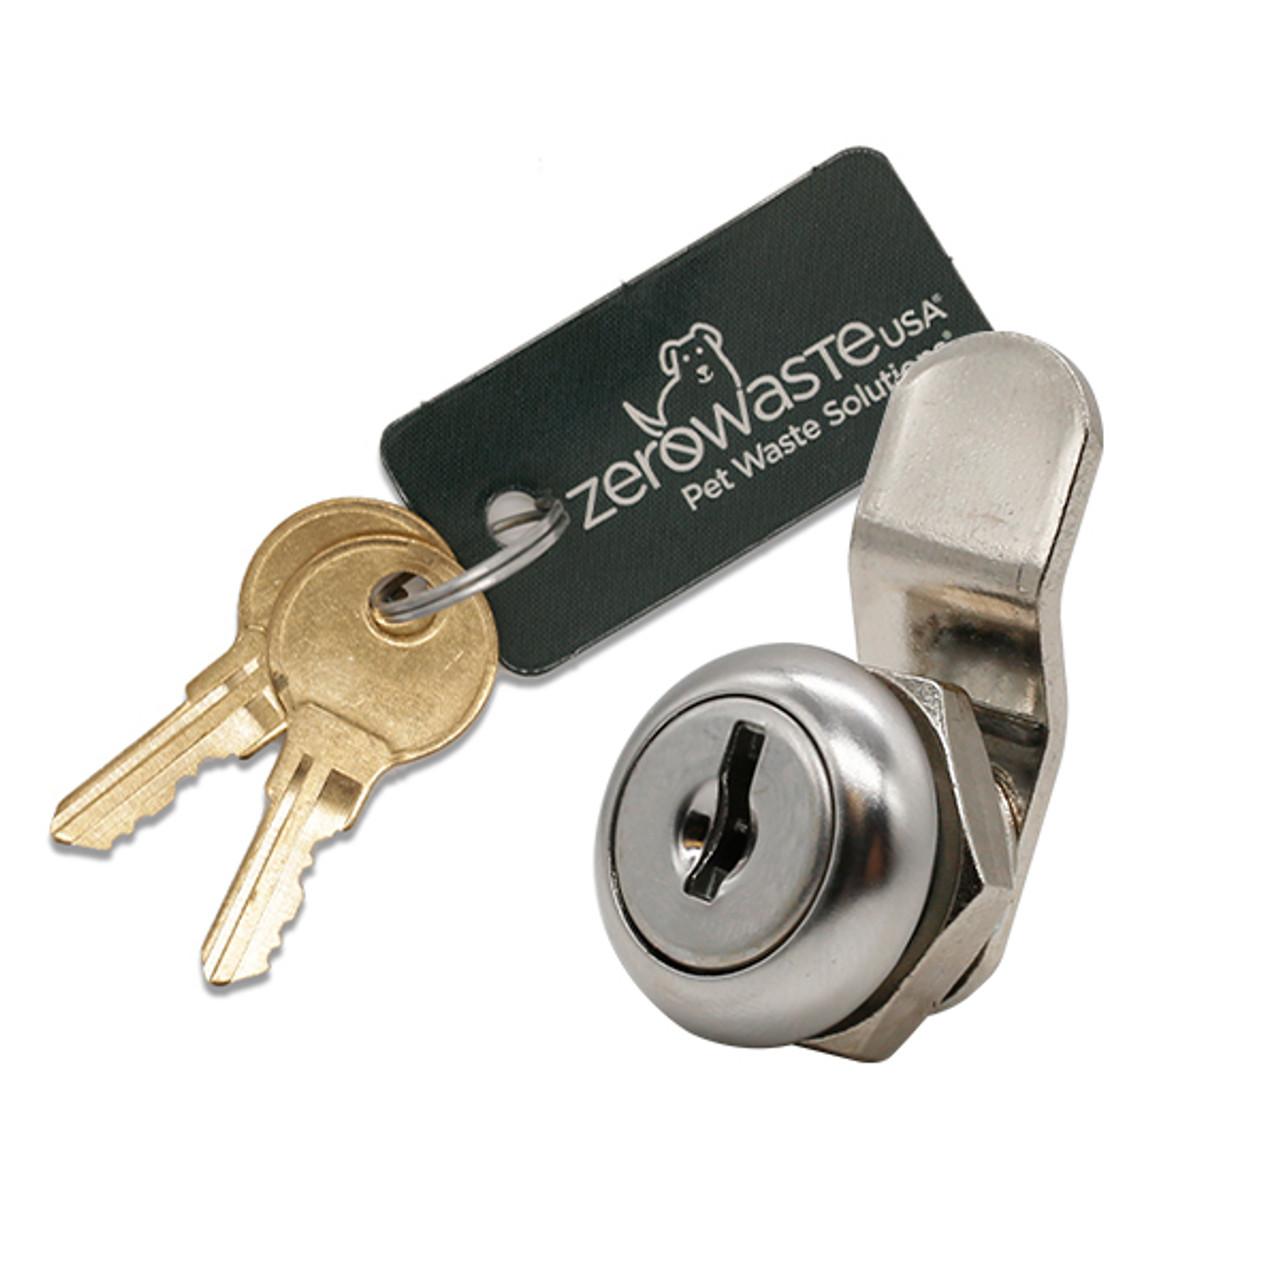 Replacement Dispenser Lock and Keys